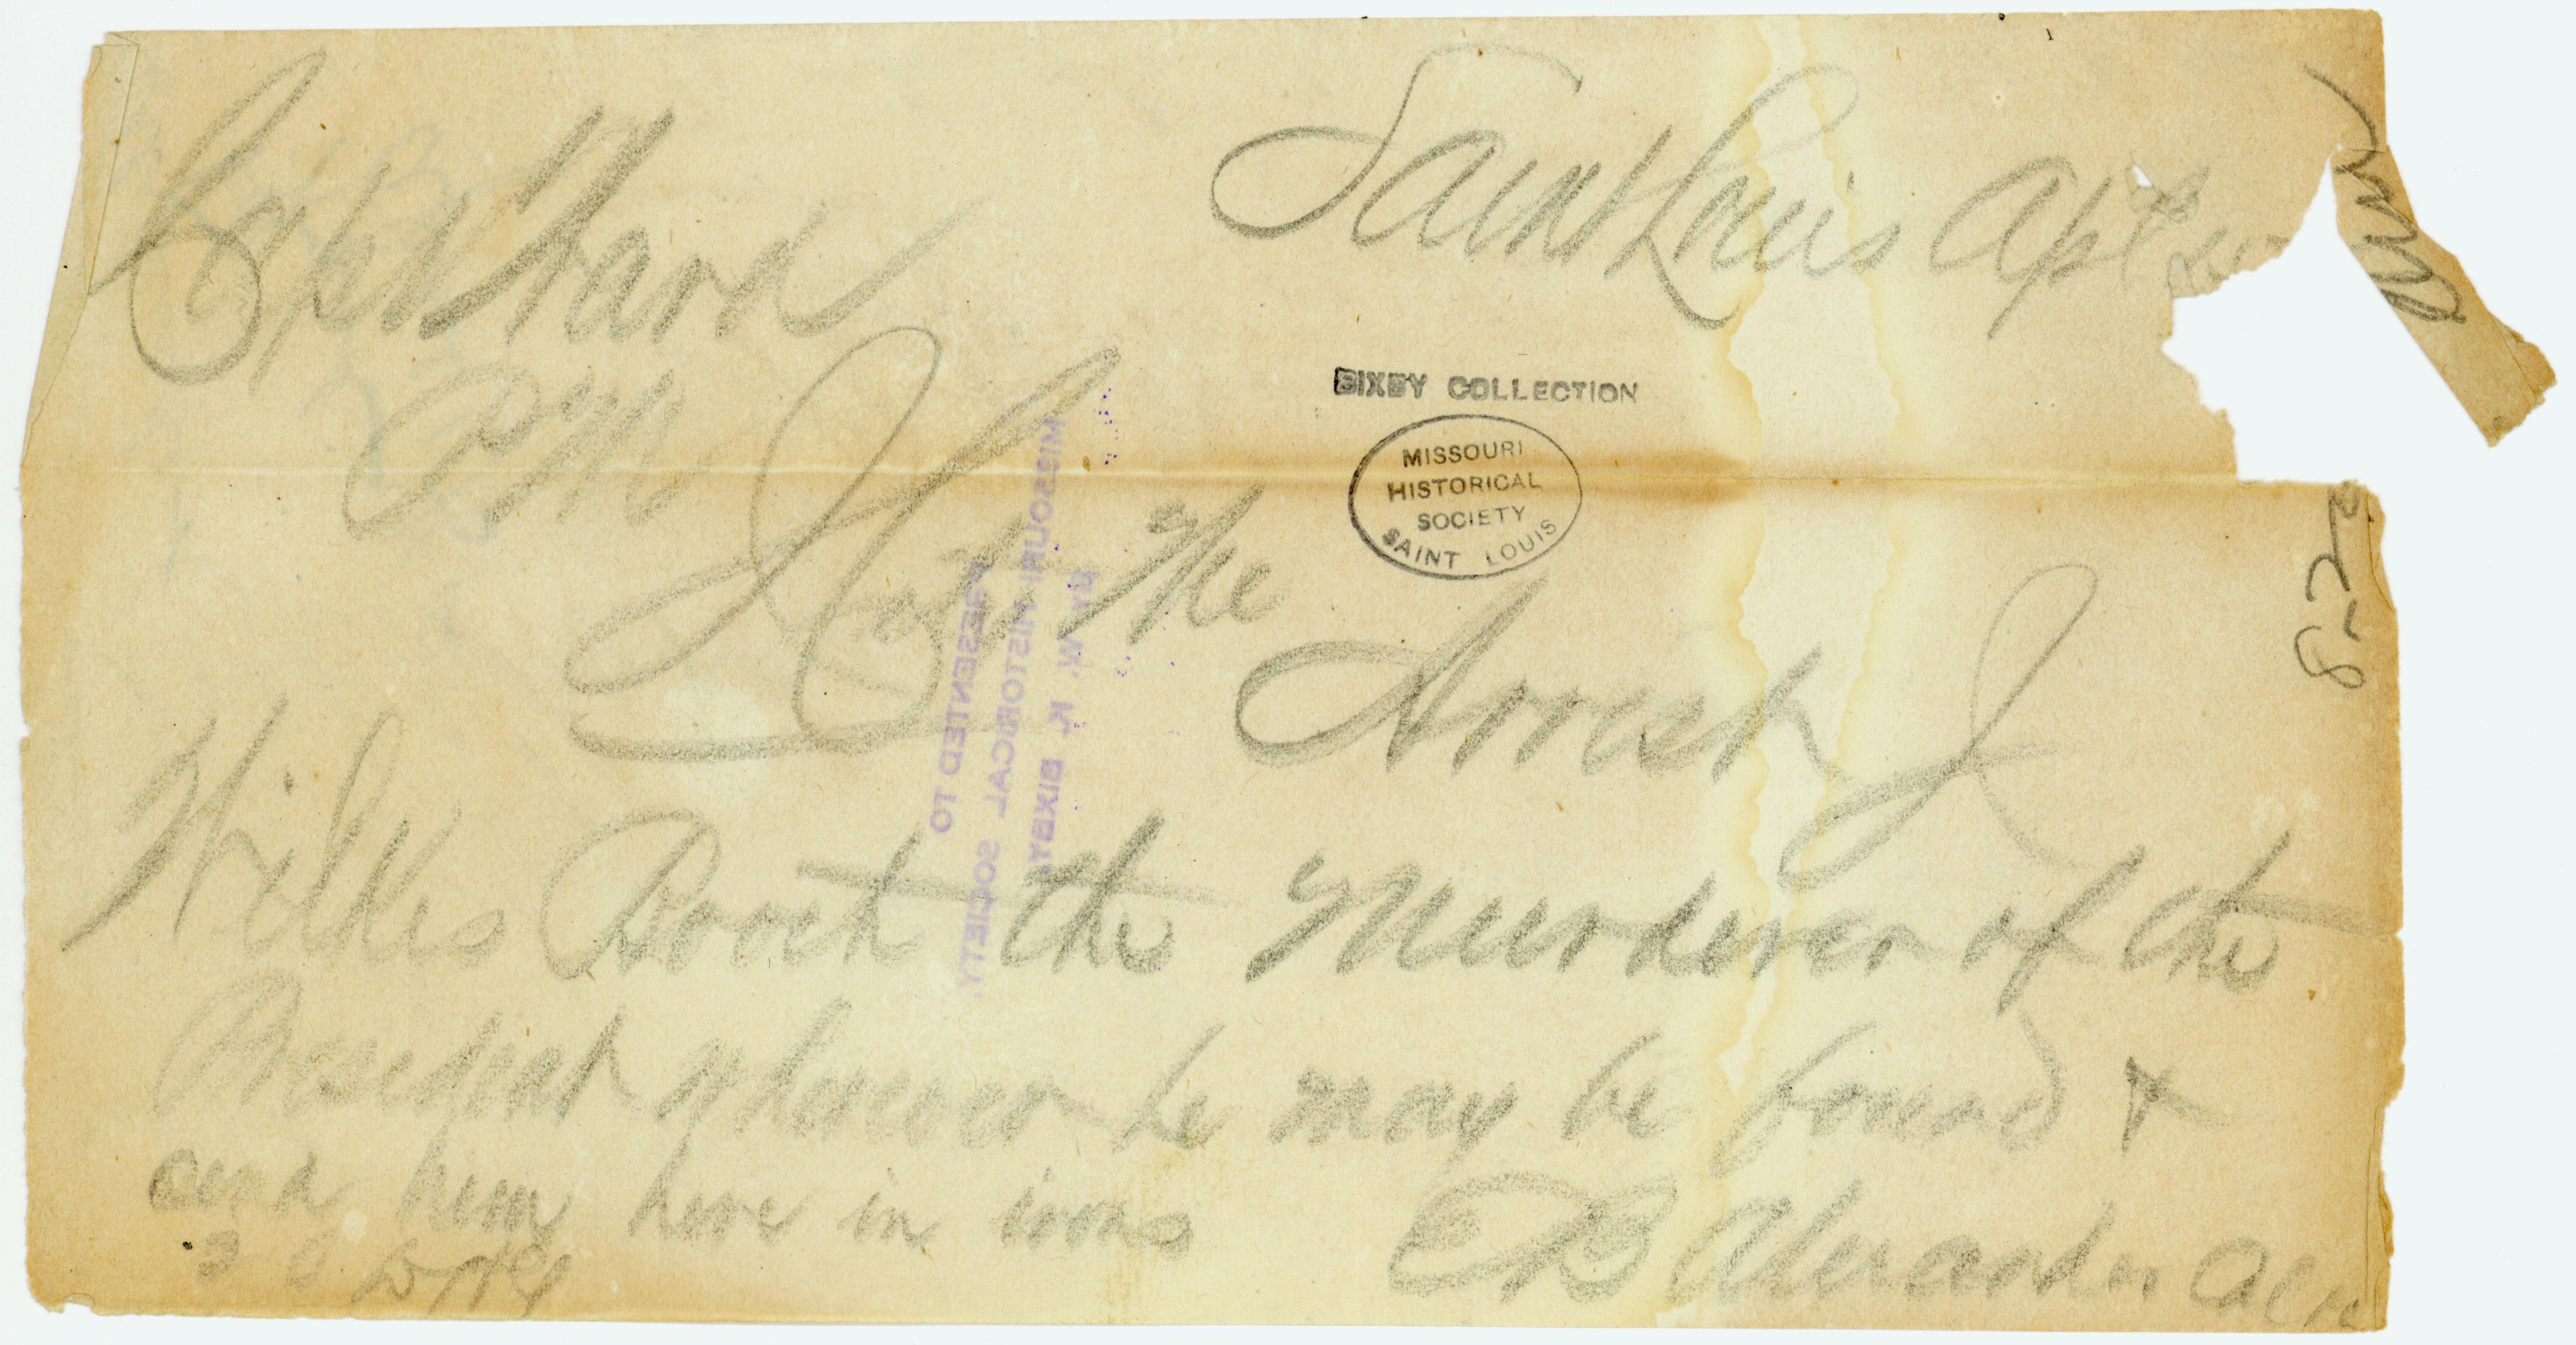 Contemporary copy of telegram of E. B. Alexander, Saint Louis, to Capt. Ward, Jefferson City, April 15, [1865]